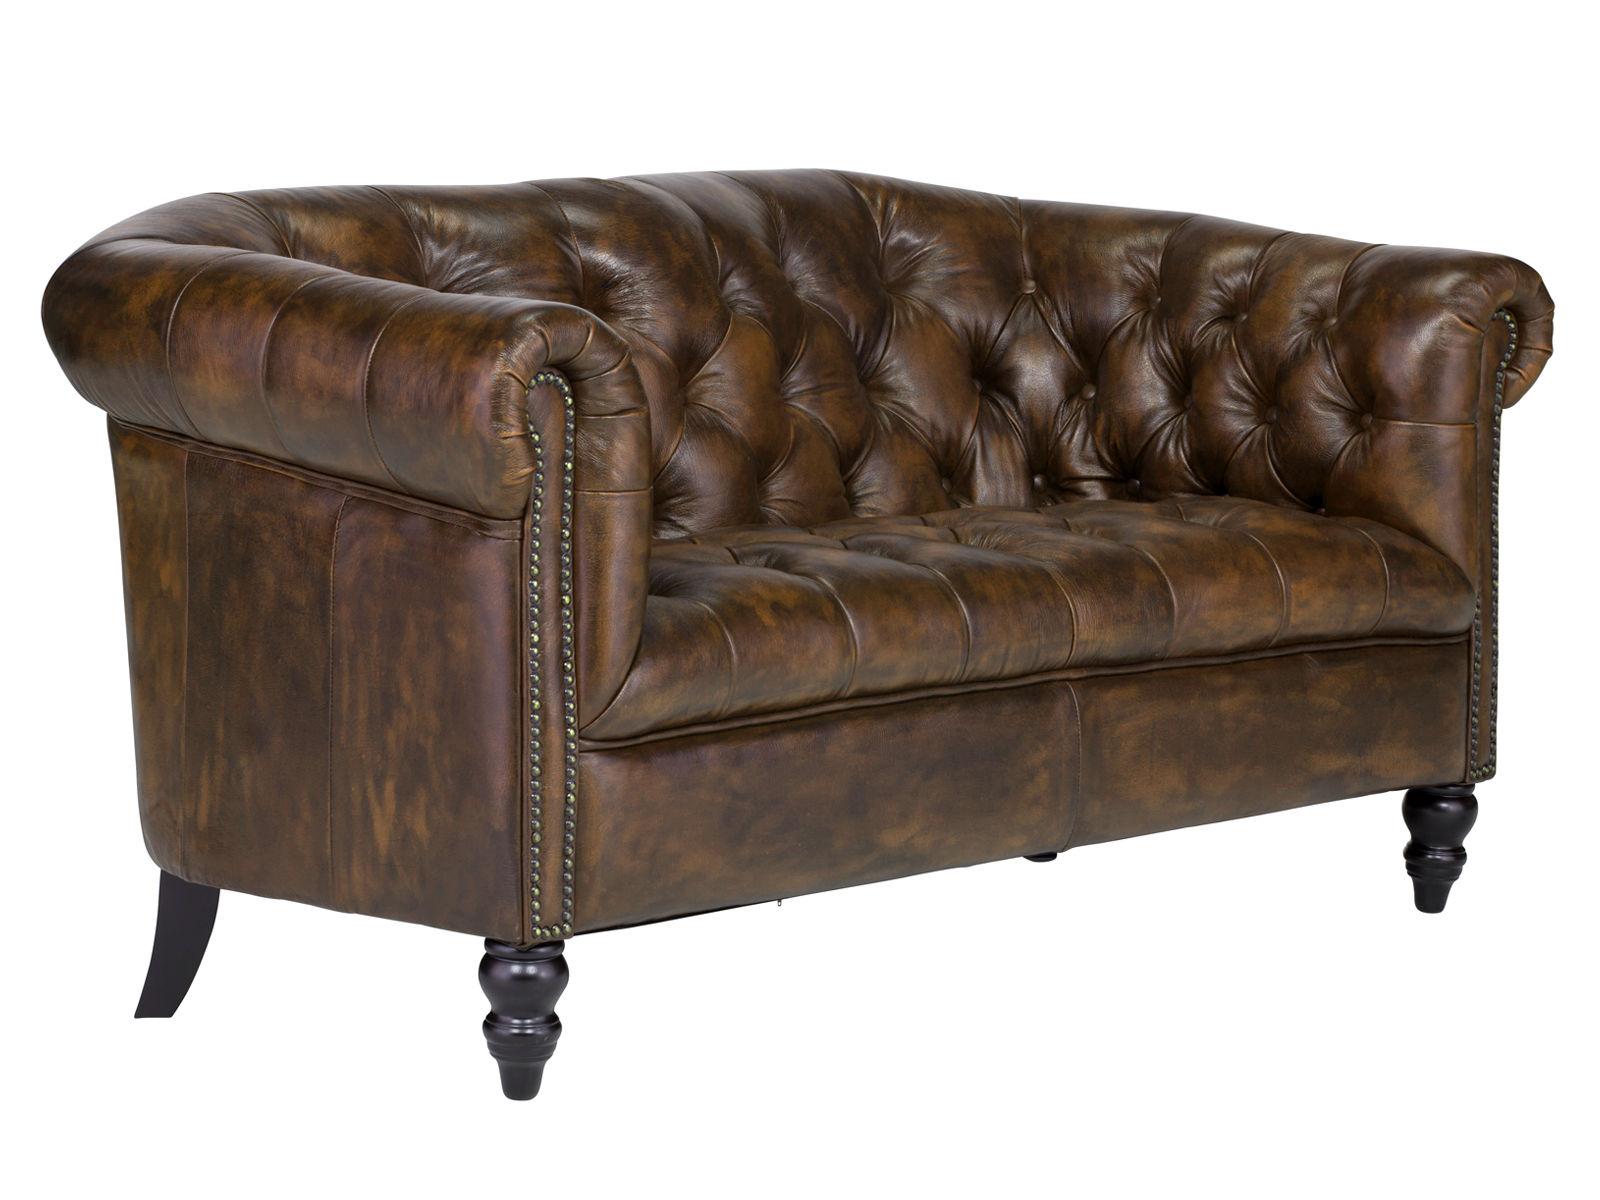 Sofa Chesterfield Shelford 2-Sitzer antik braun